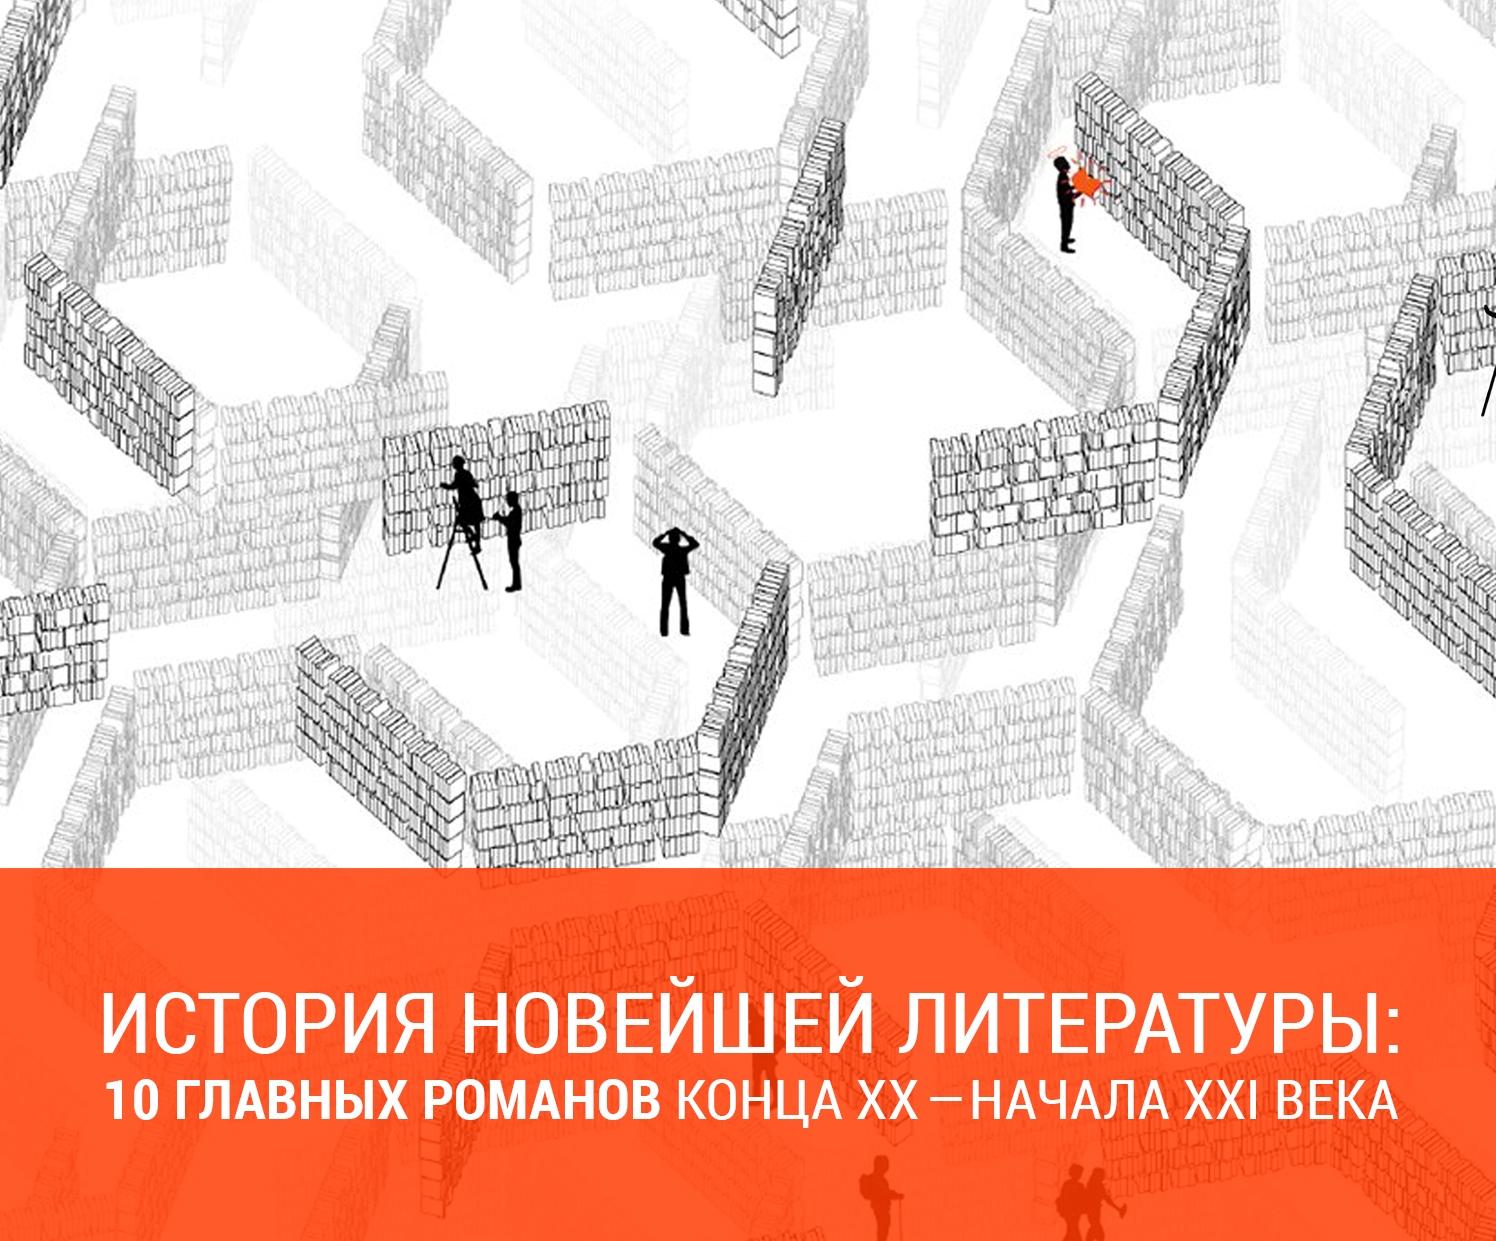 история_литературы_site.jpg